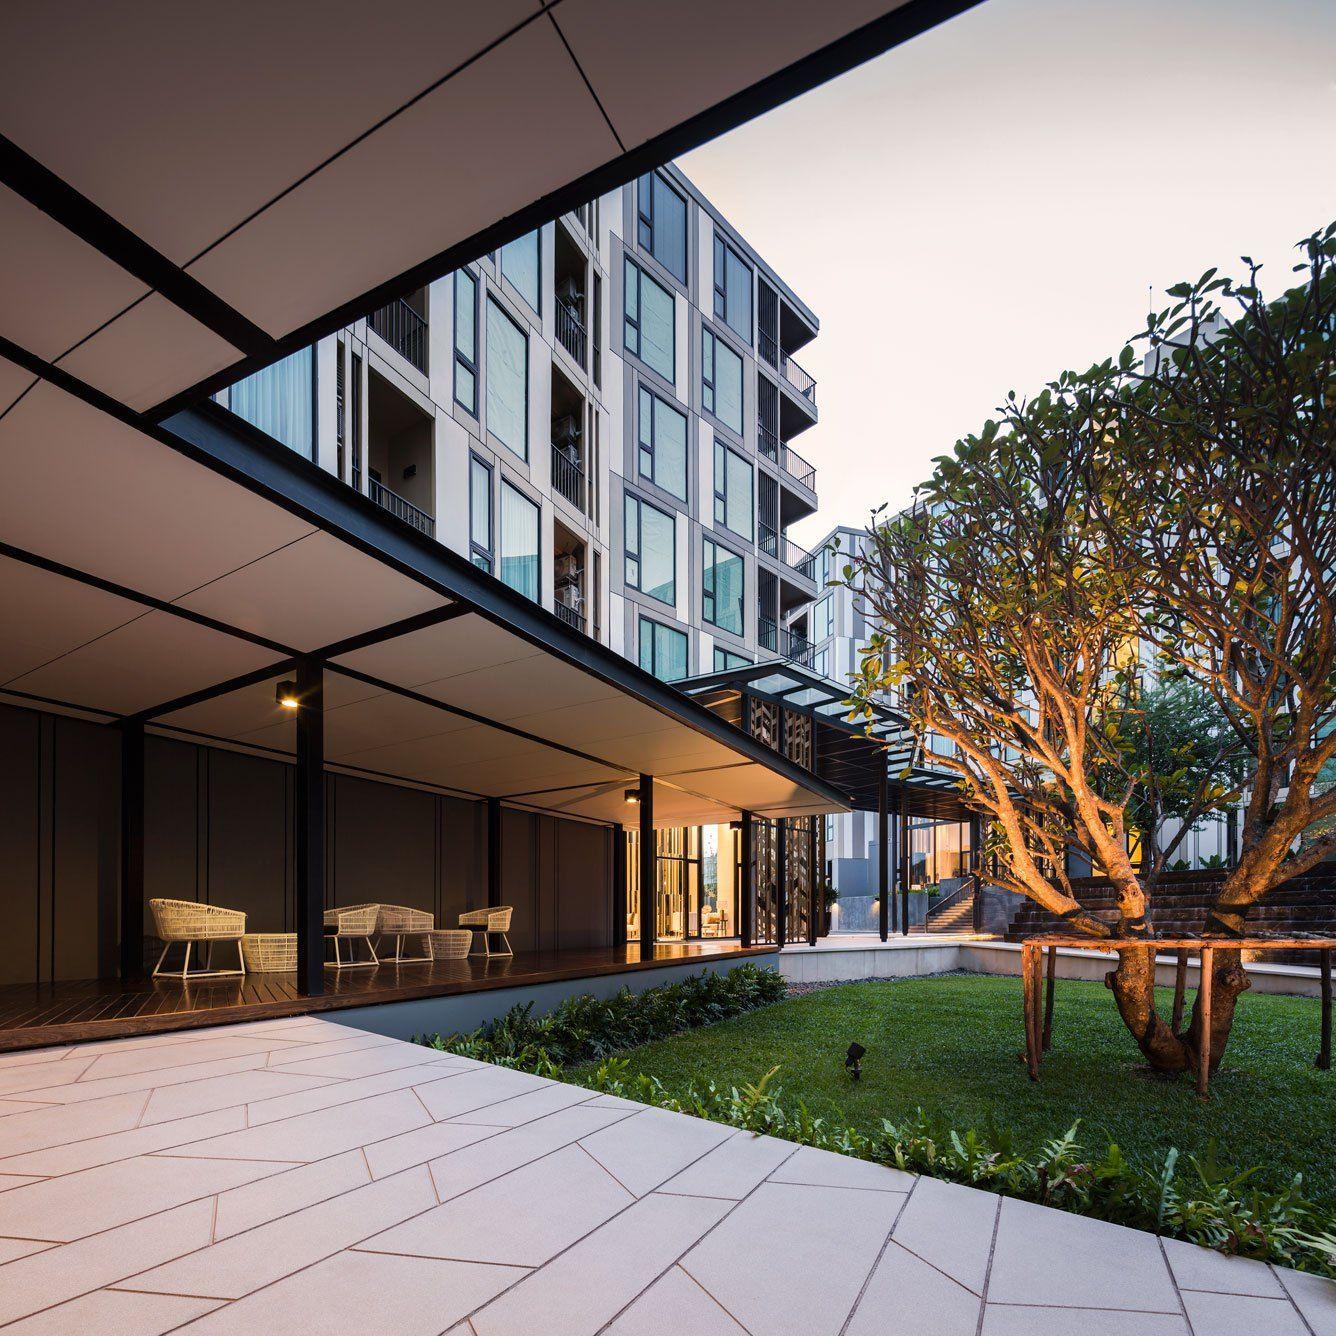 Landscape Lighting Planner: The Base Uptown Phuket Condominium By Open Box.